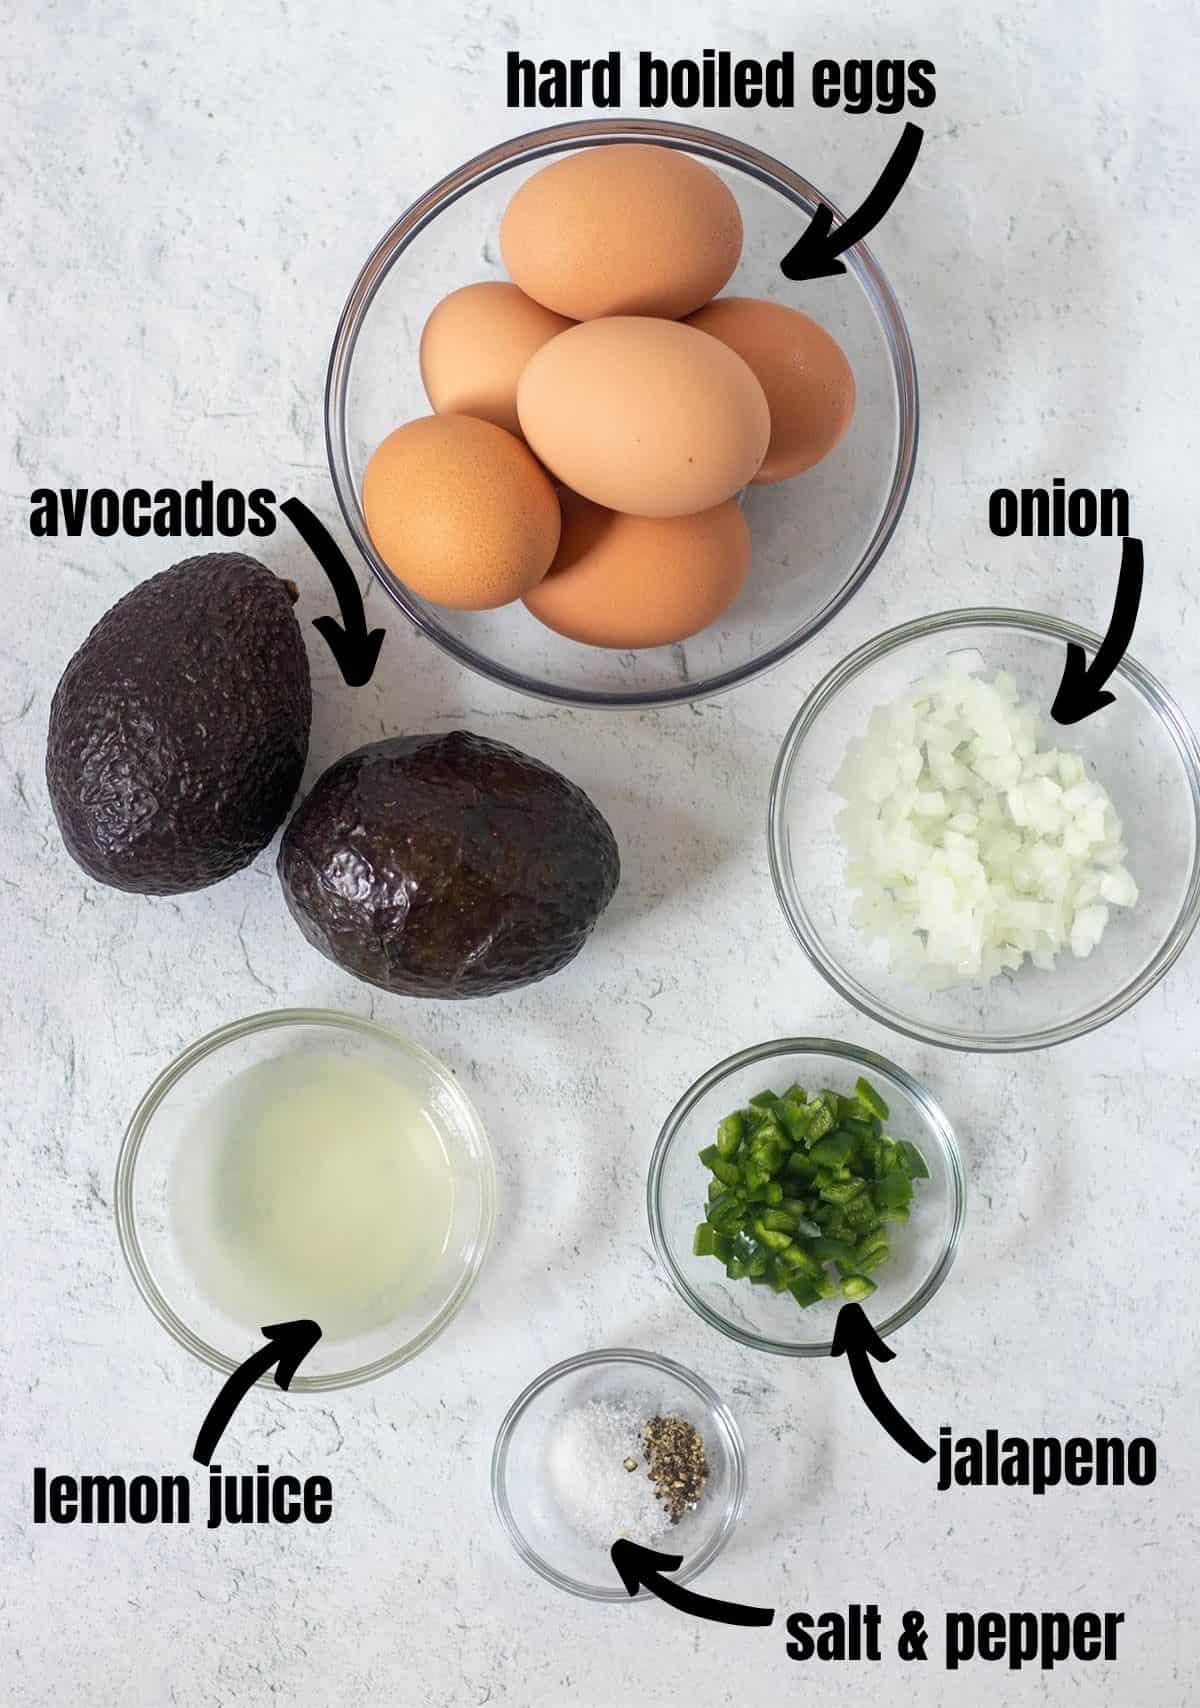 hard boiled eggs, avocados, onion, lemon juice, jalapeno, salt & pepper.